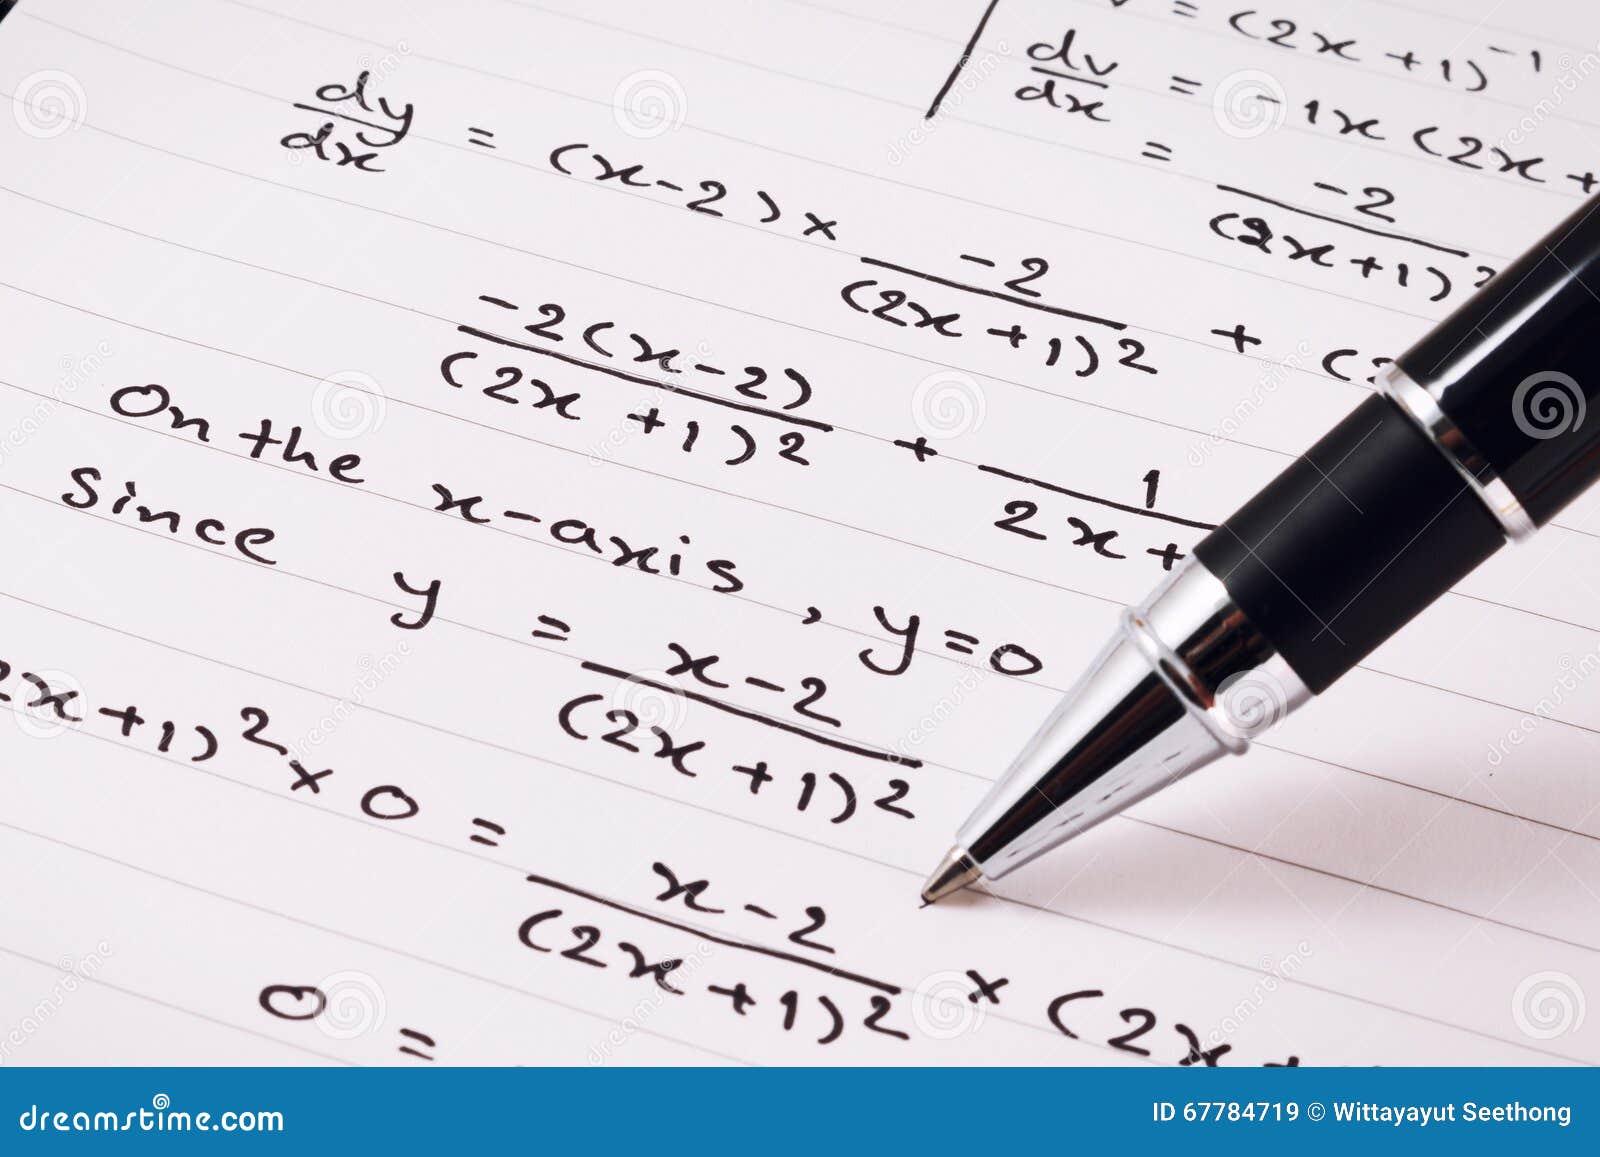 Homework math solver